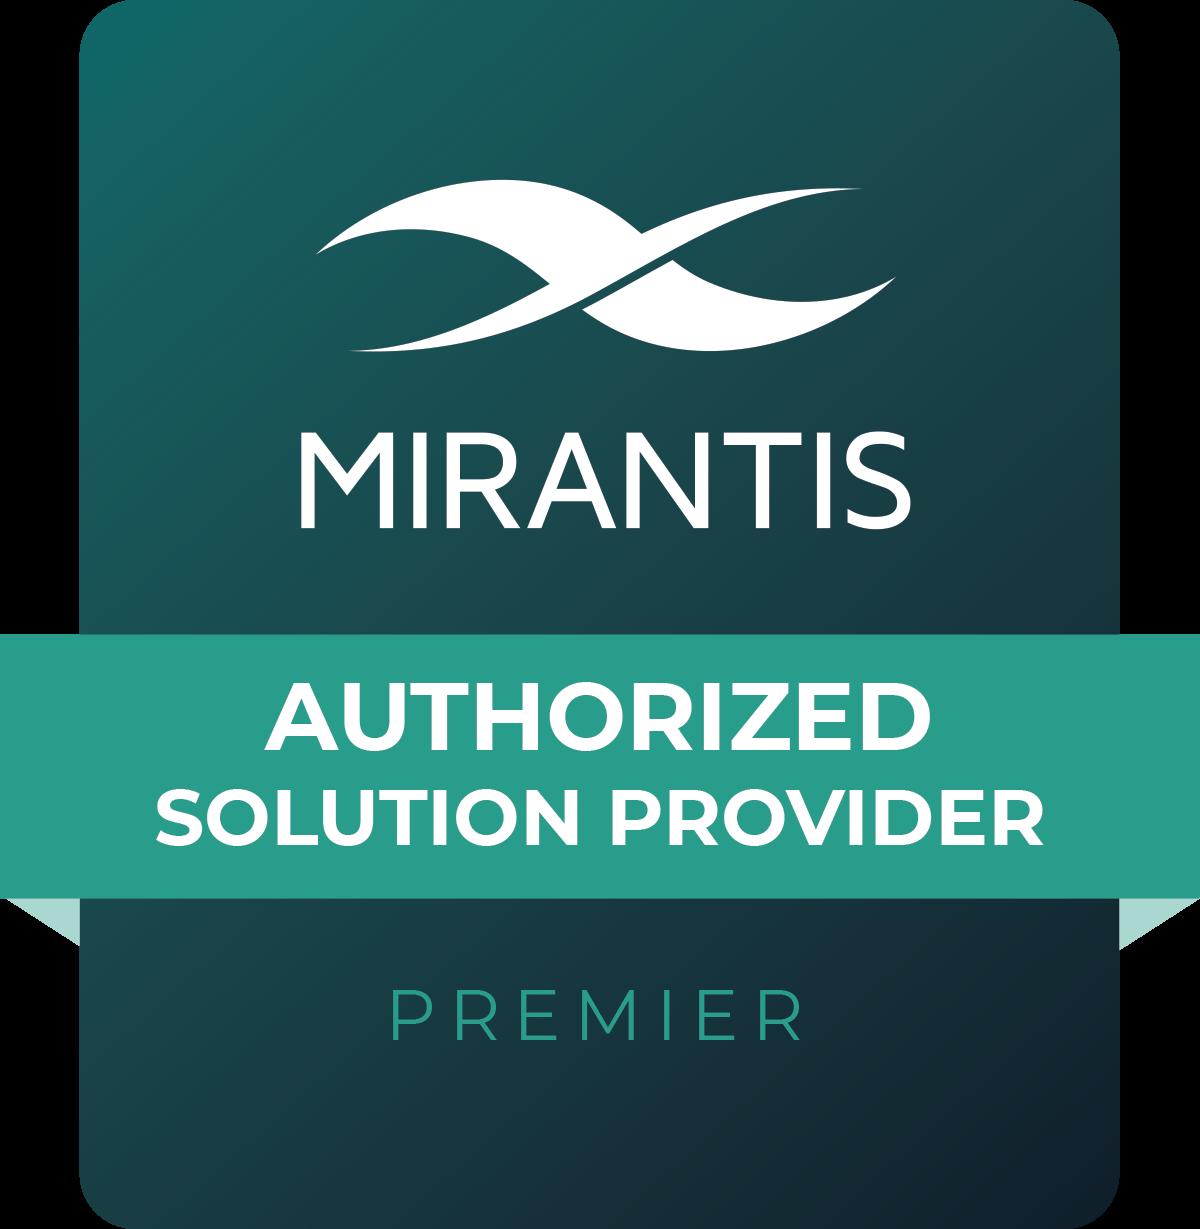 Mirantis Premier partner logo